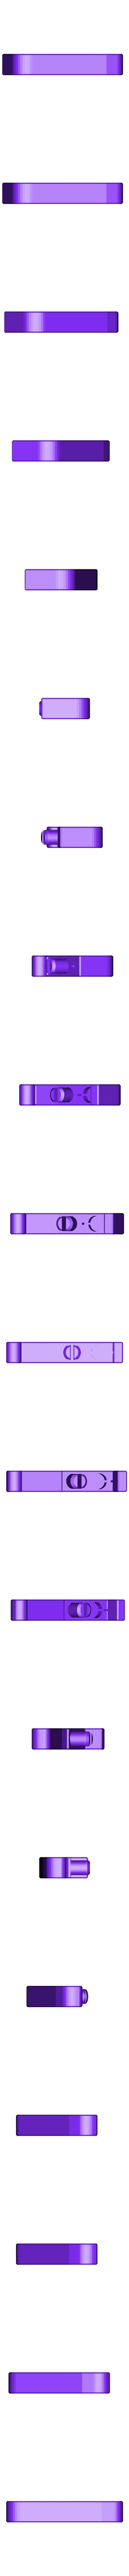 Belt_holder-Clip.STL Download free STL file PortaReel Portable Fishing Pole • 3D printable model, mechengineermike